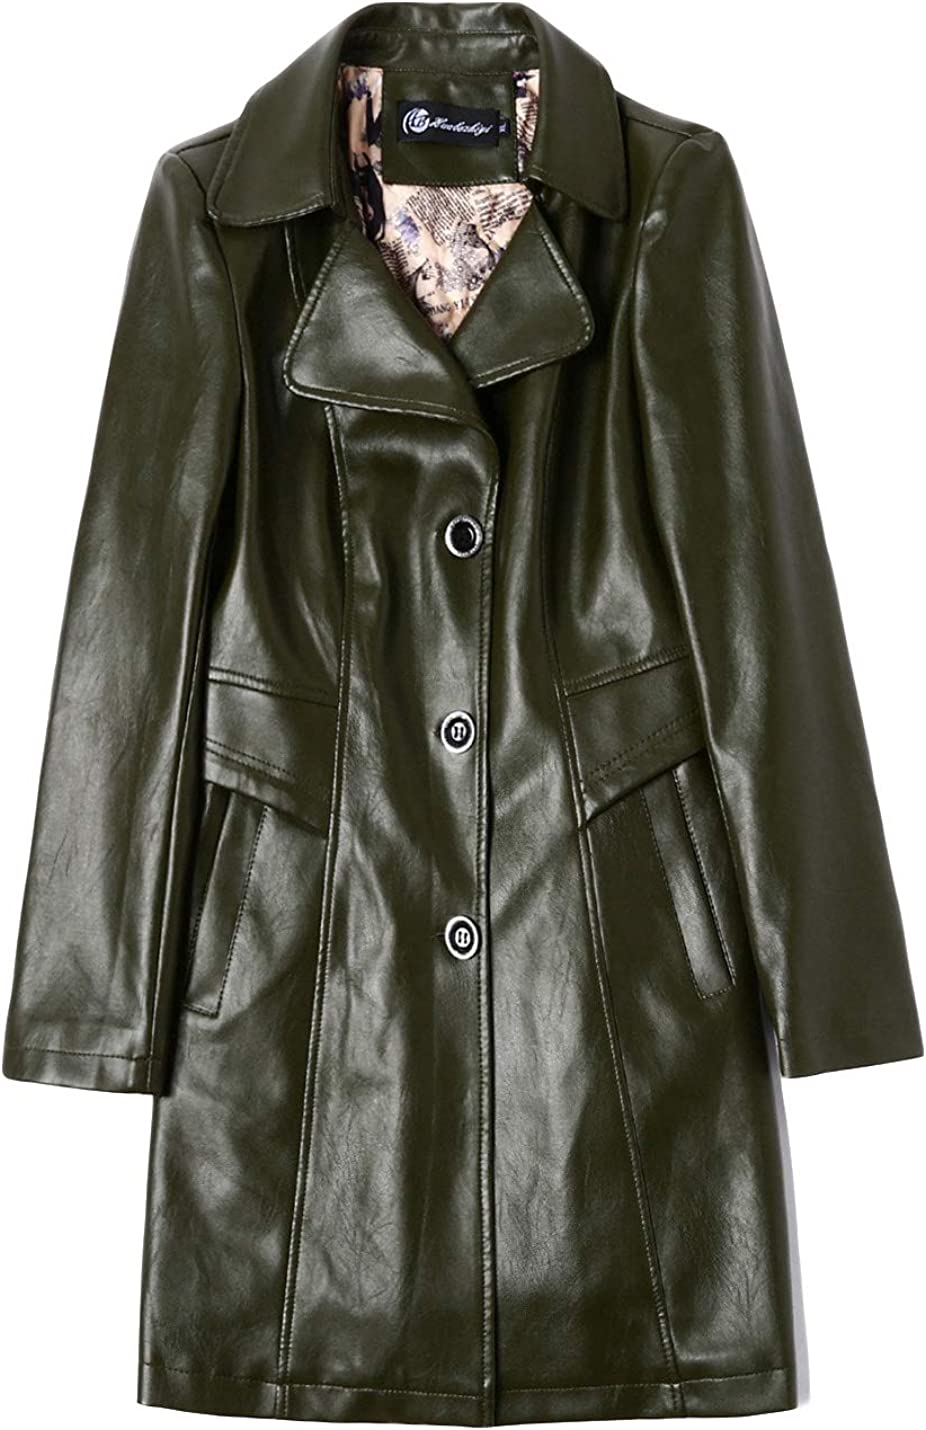 Gihuo Max 70% OFF Women's Warm PU Leather Swing [Alternative dealer] Jacket Long Trench Coat